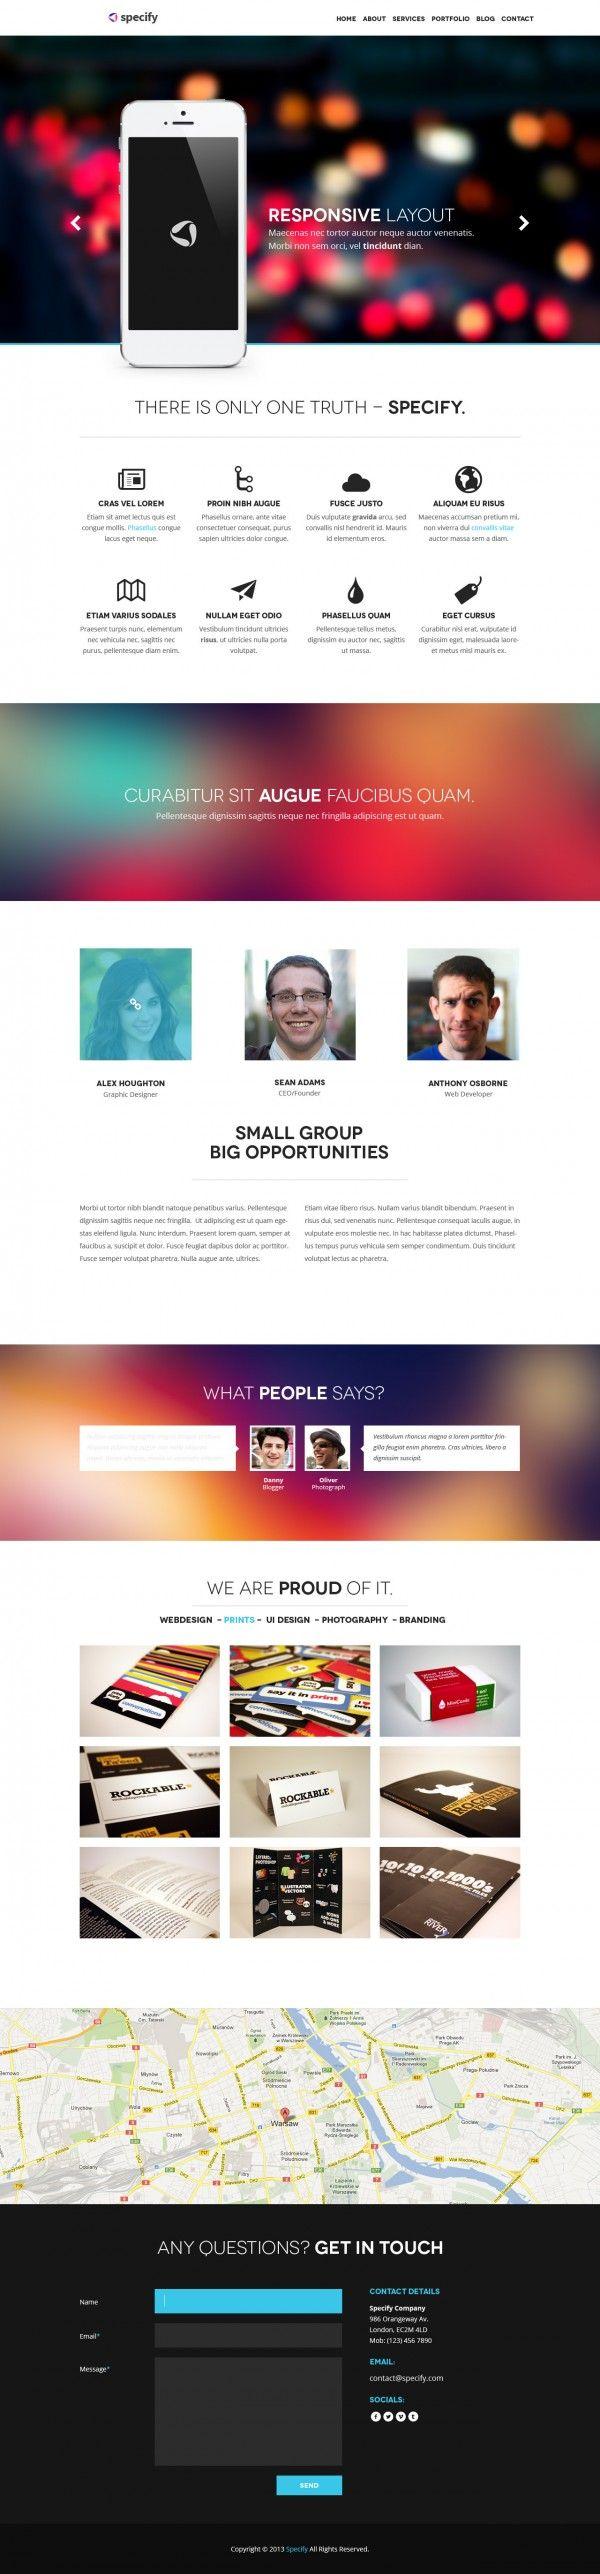 Responsive Template #WebDesign #UX #UI #WebPageLayout #DigitalDesign #inspiration #creativity #concept #art #art_direction #grid #layout #design #layout_design #graphic #graphic_layout #graphic_design #ui #ux #web #web_design #website #web_layout #responsive #responsive_design #responsive_layout #digital_design